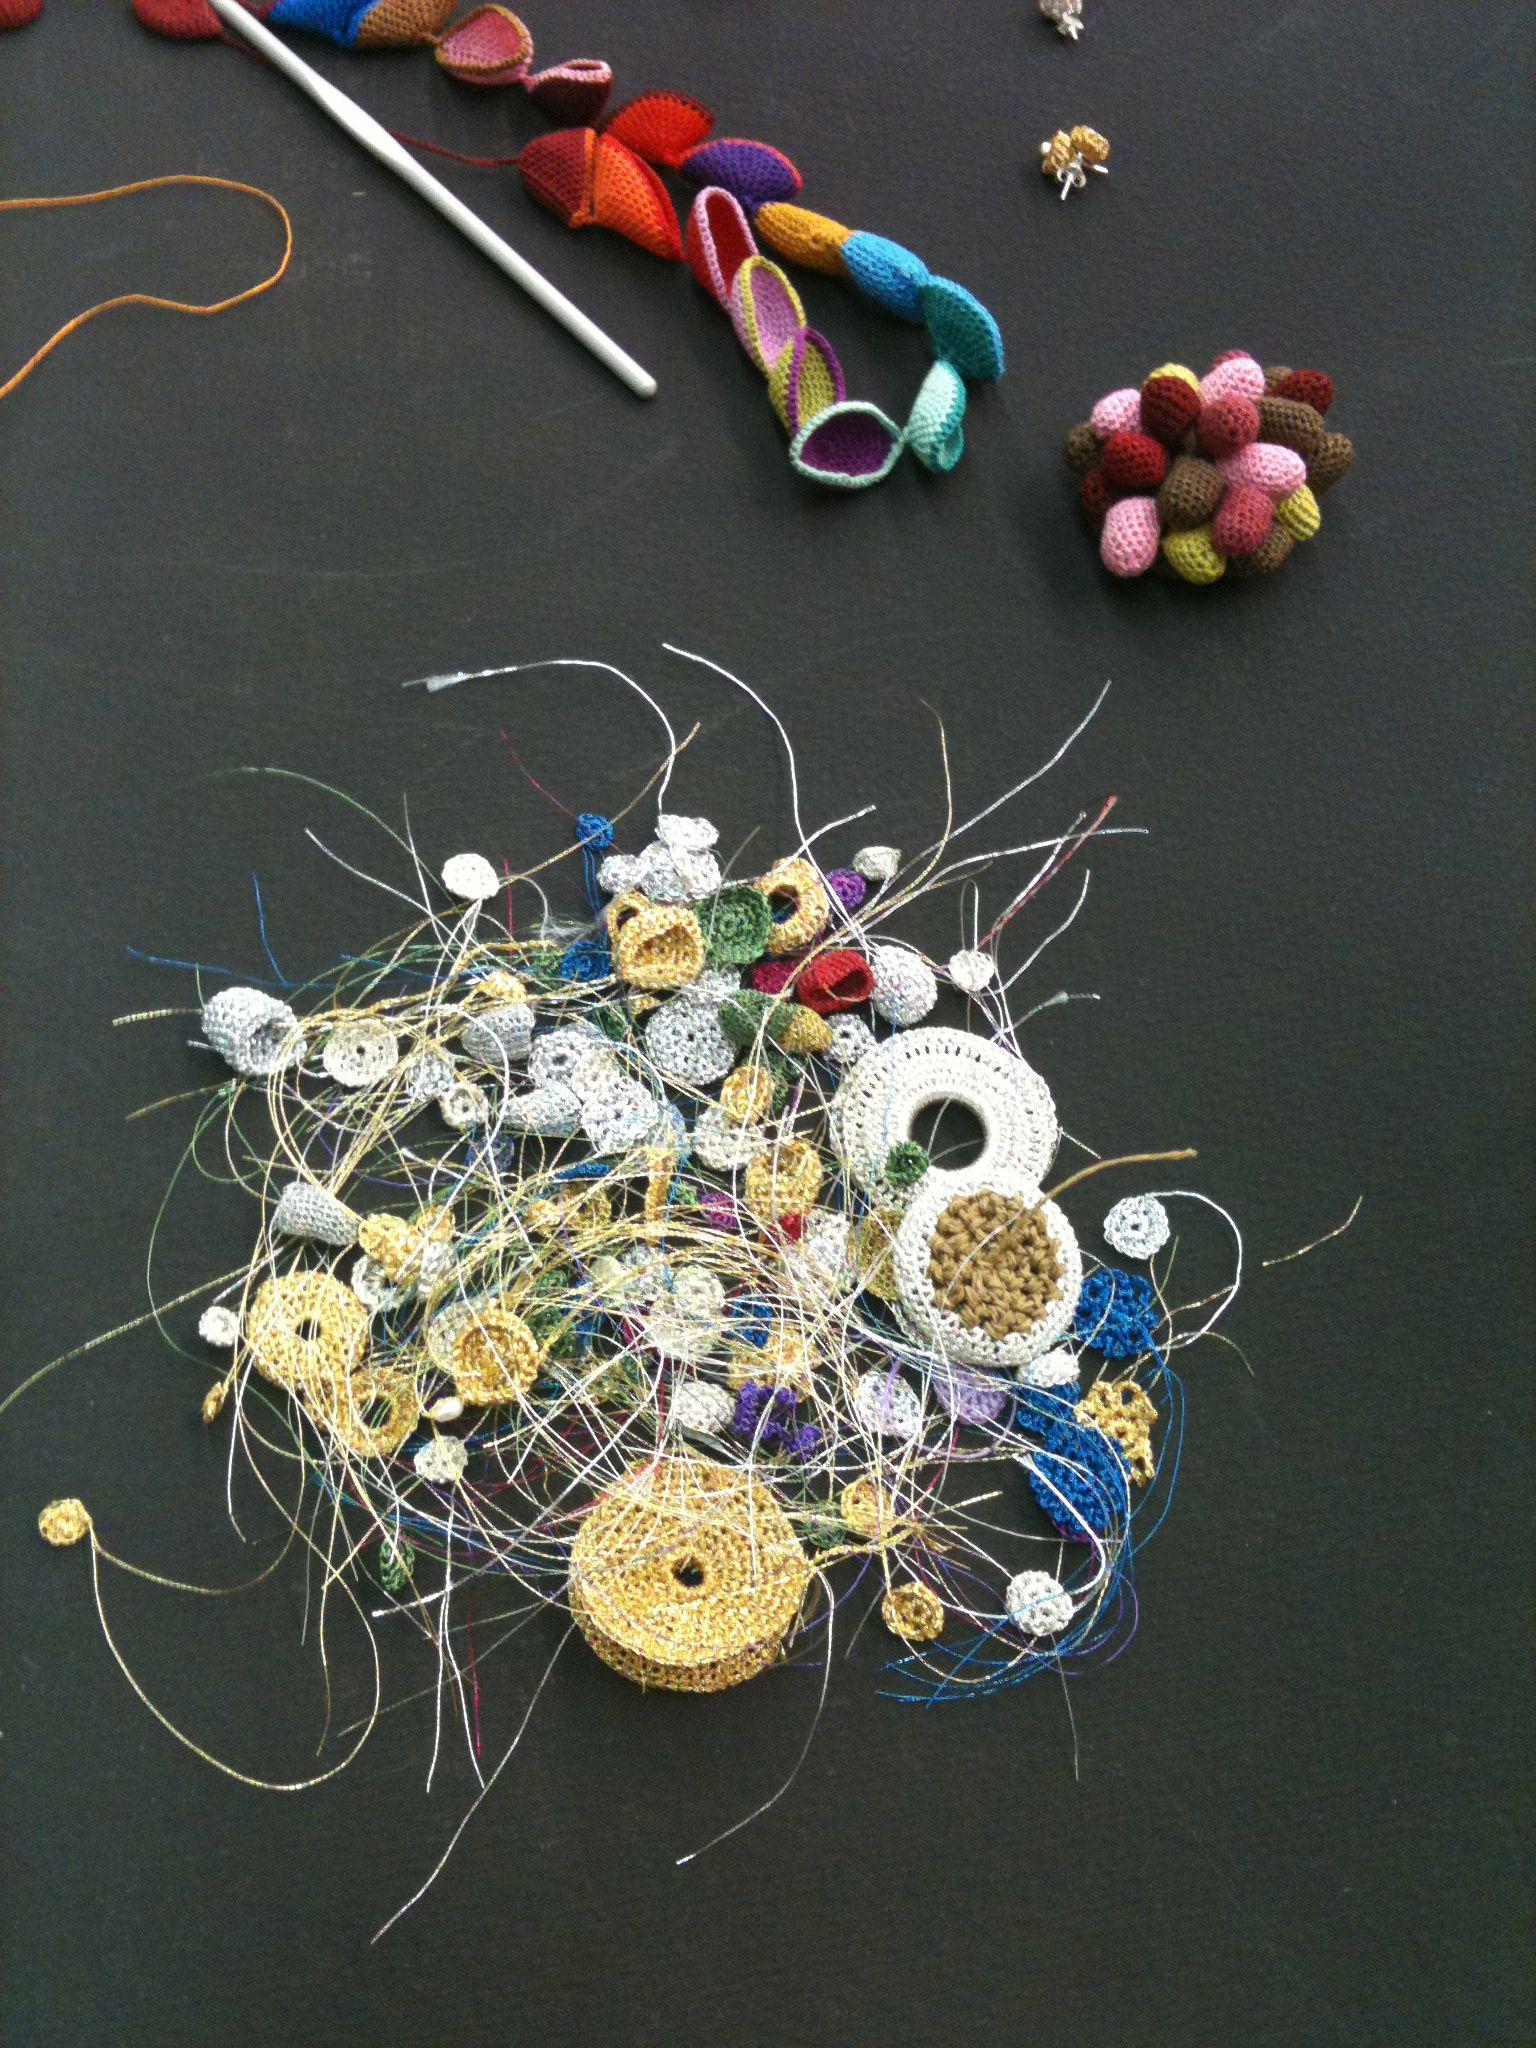 Gemma Pampalona crochet jewellery